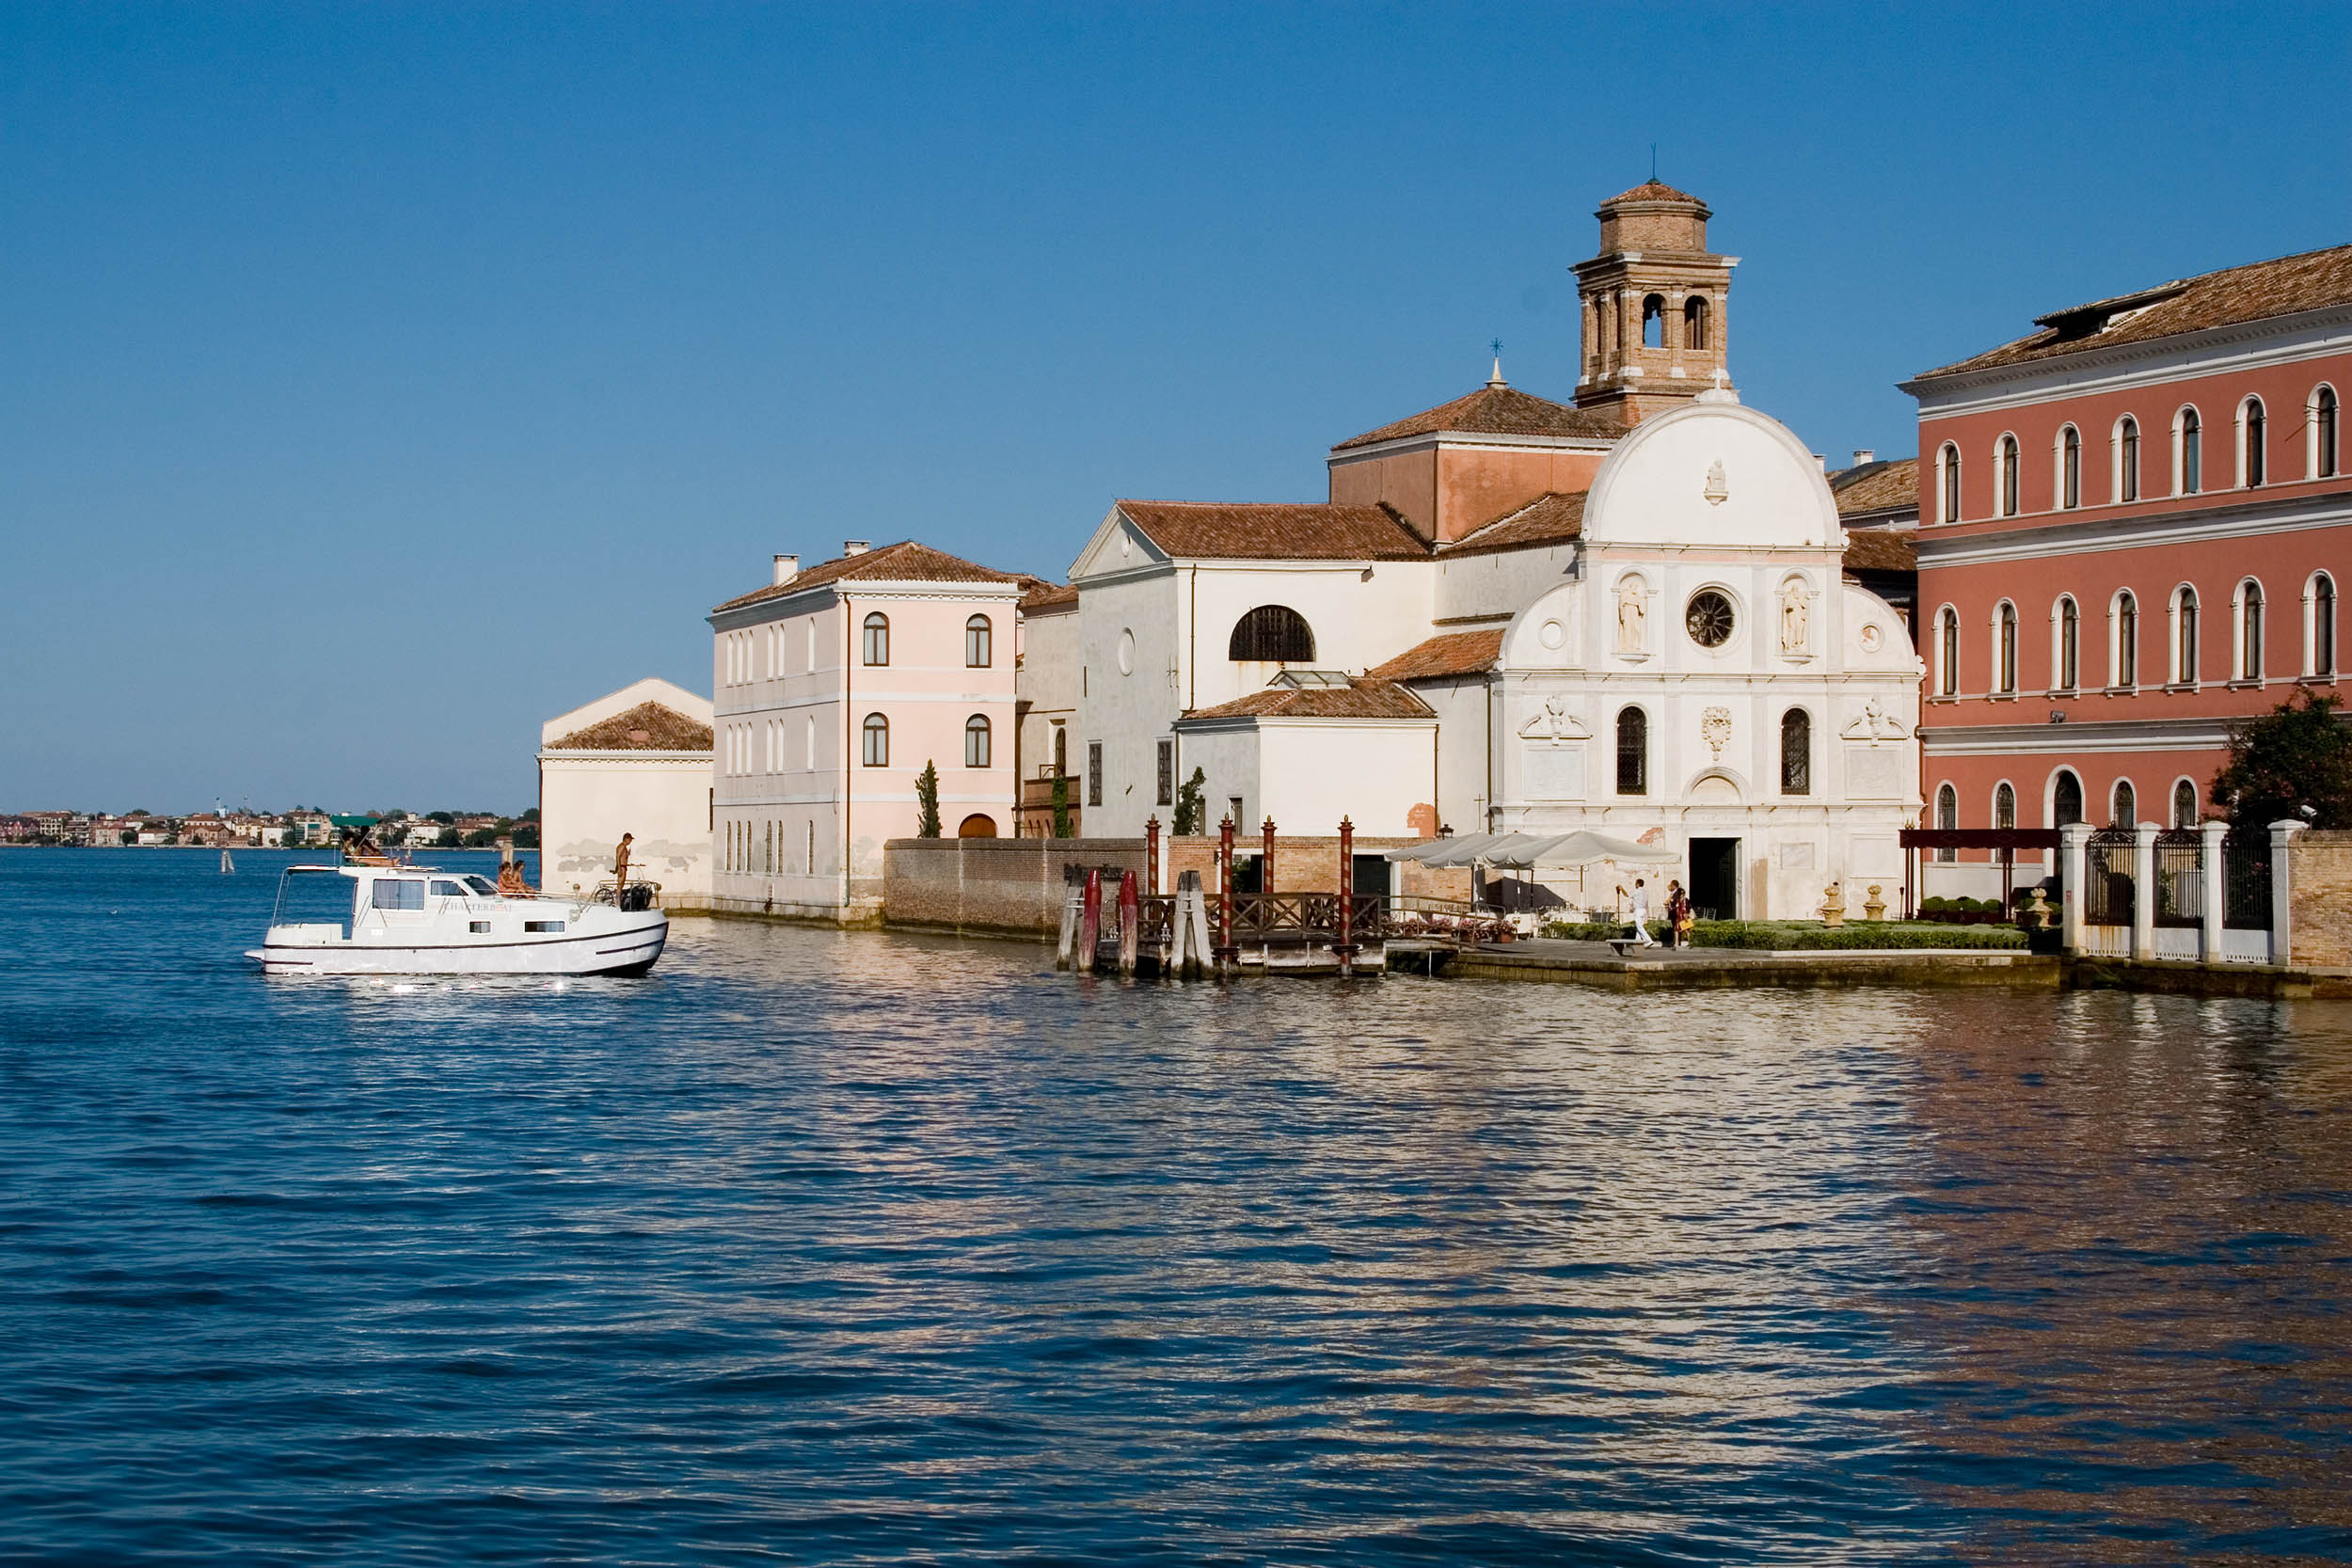 Houseboat laguna di Venezia San Servolo elica di prua